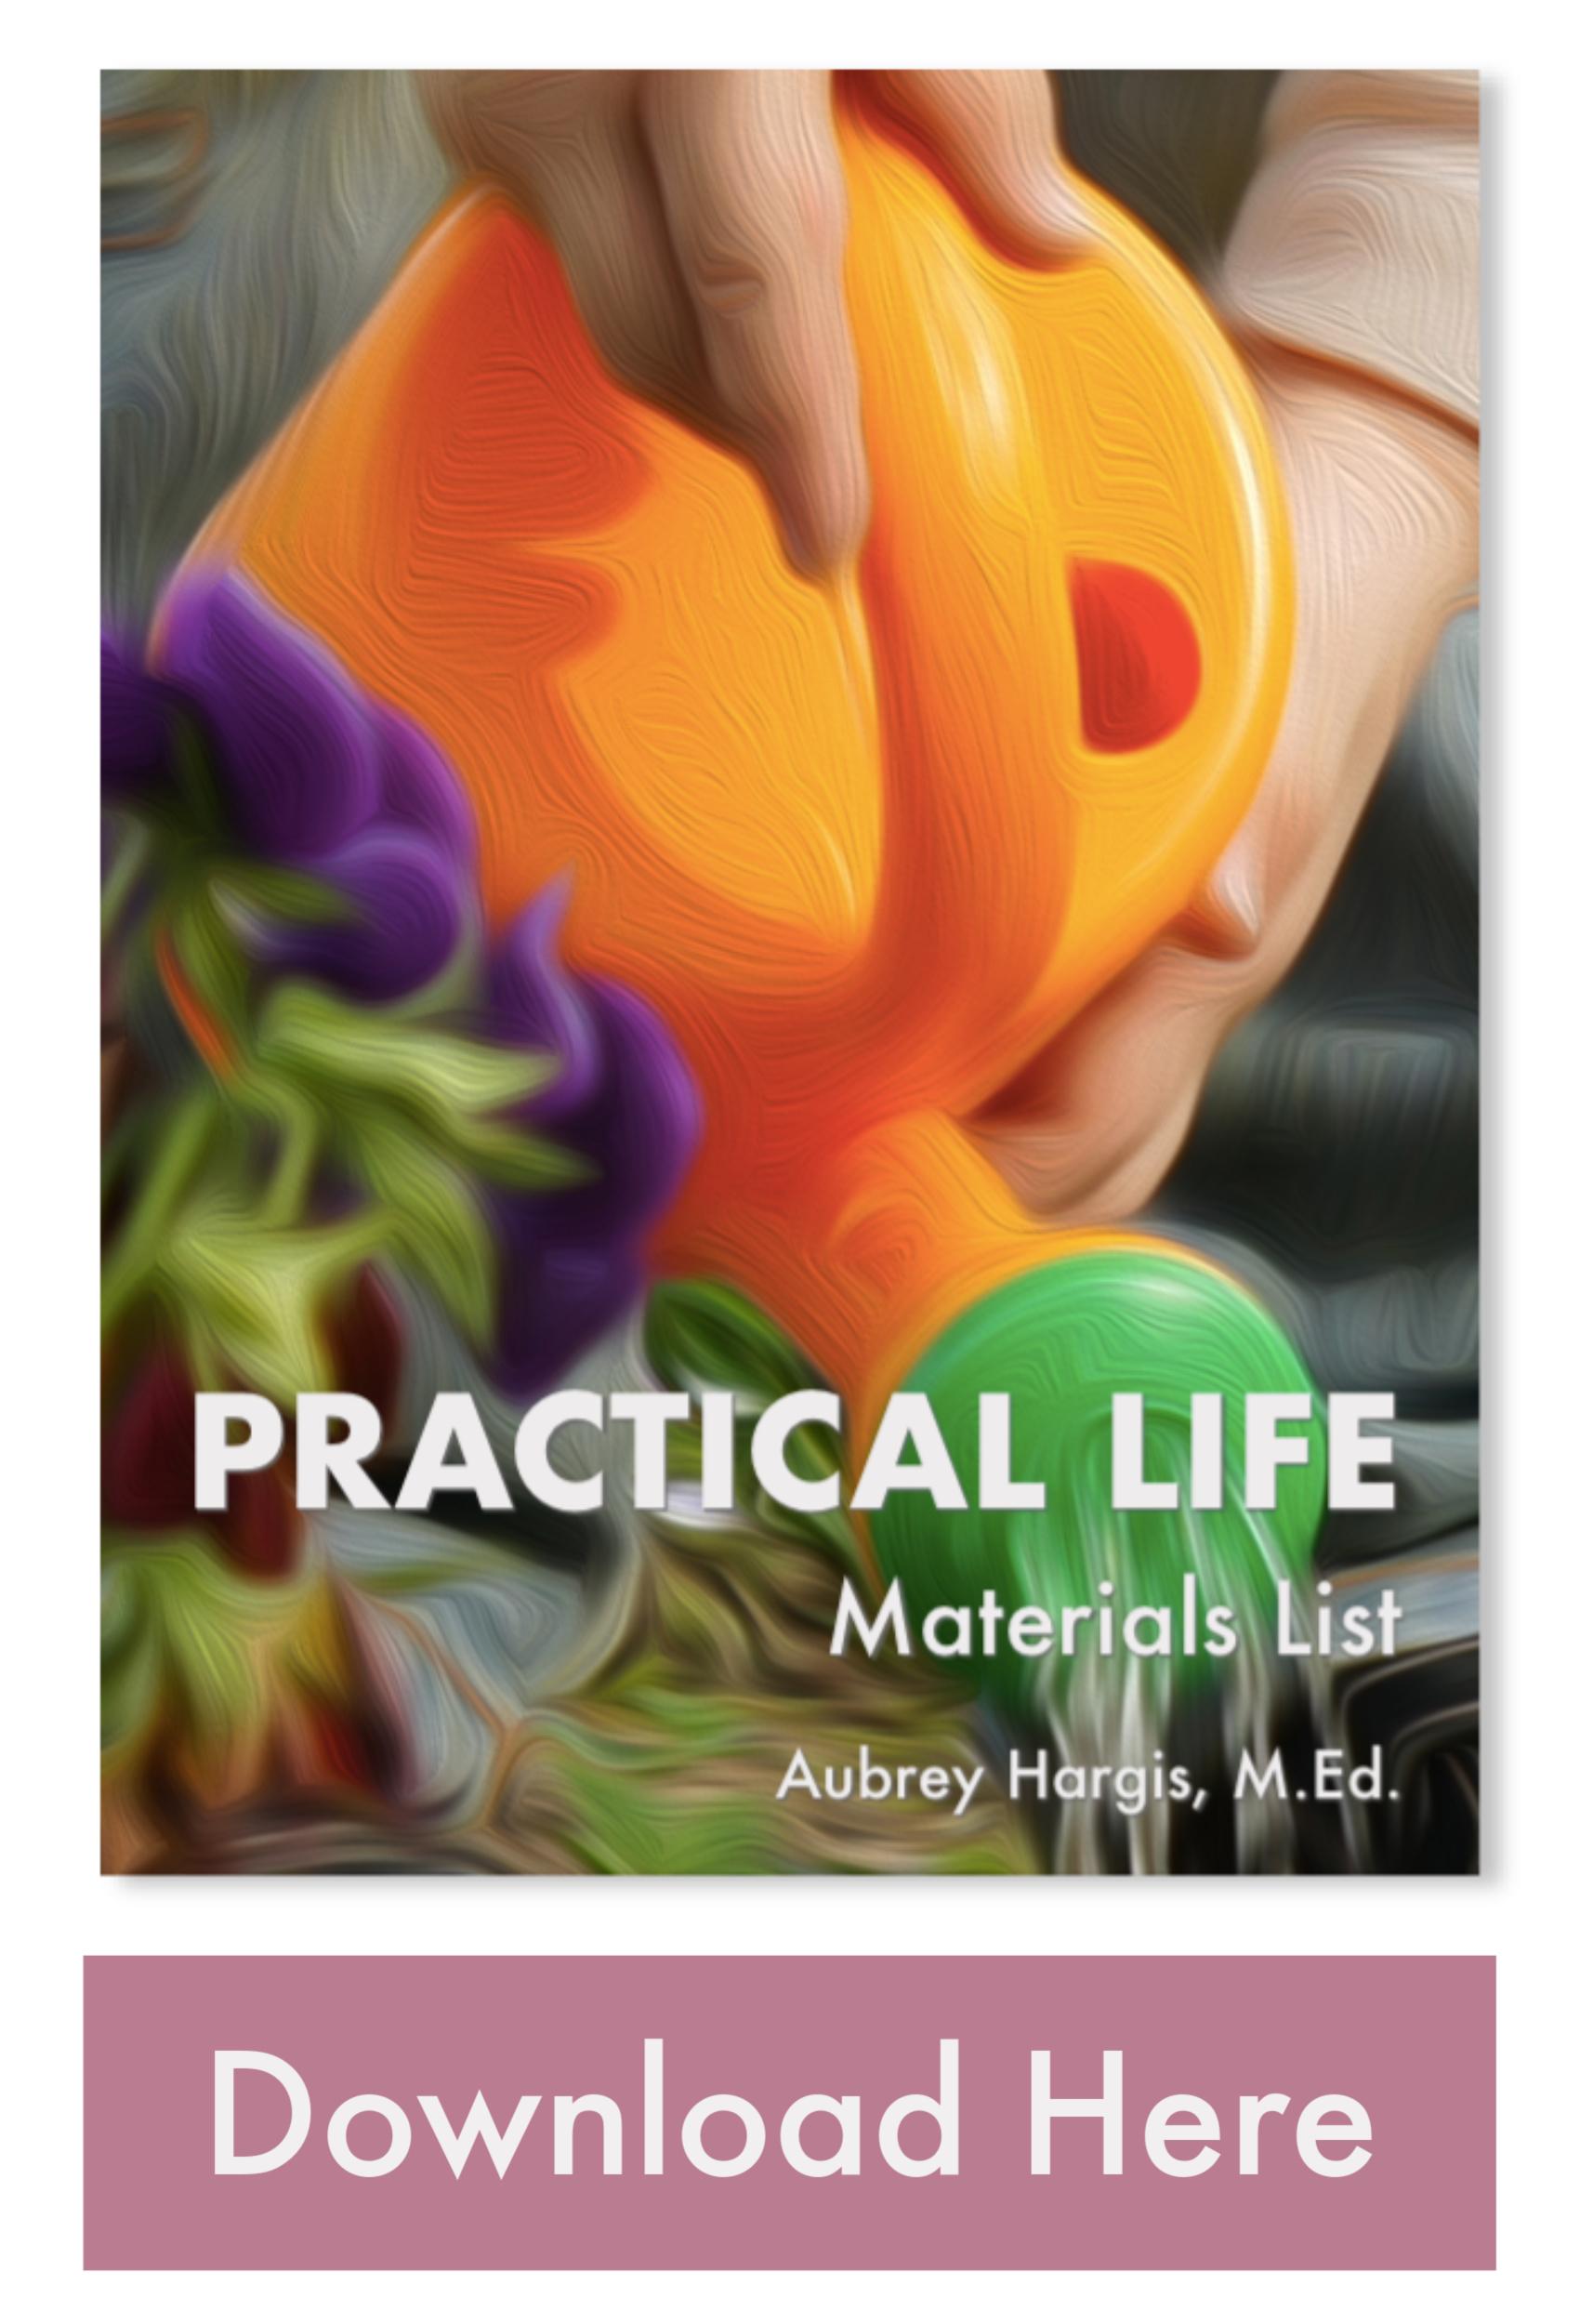 U3 Materials List PL Download Button.jpg